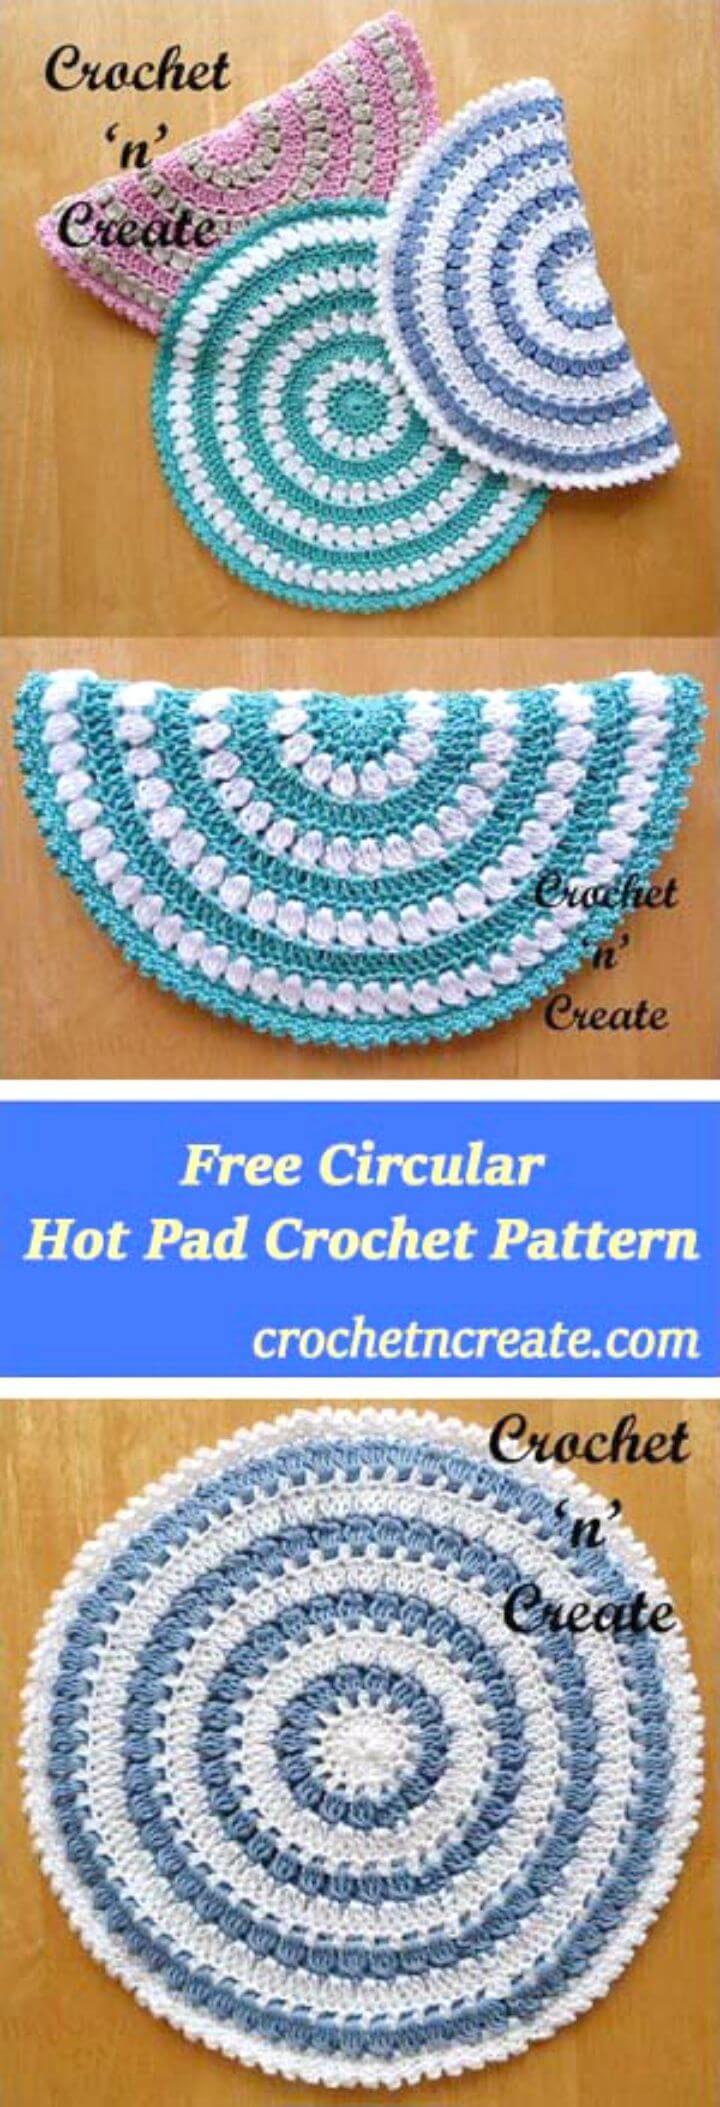 112 Free Crochet Potholder Patterns #crochetpotholderpatterns